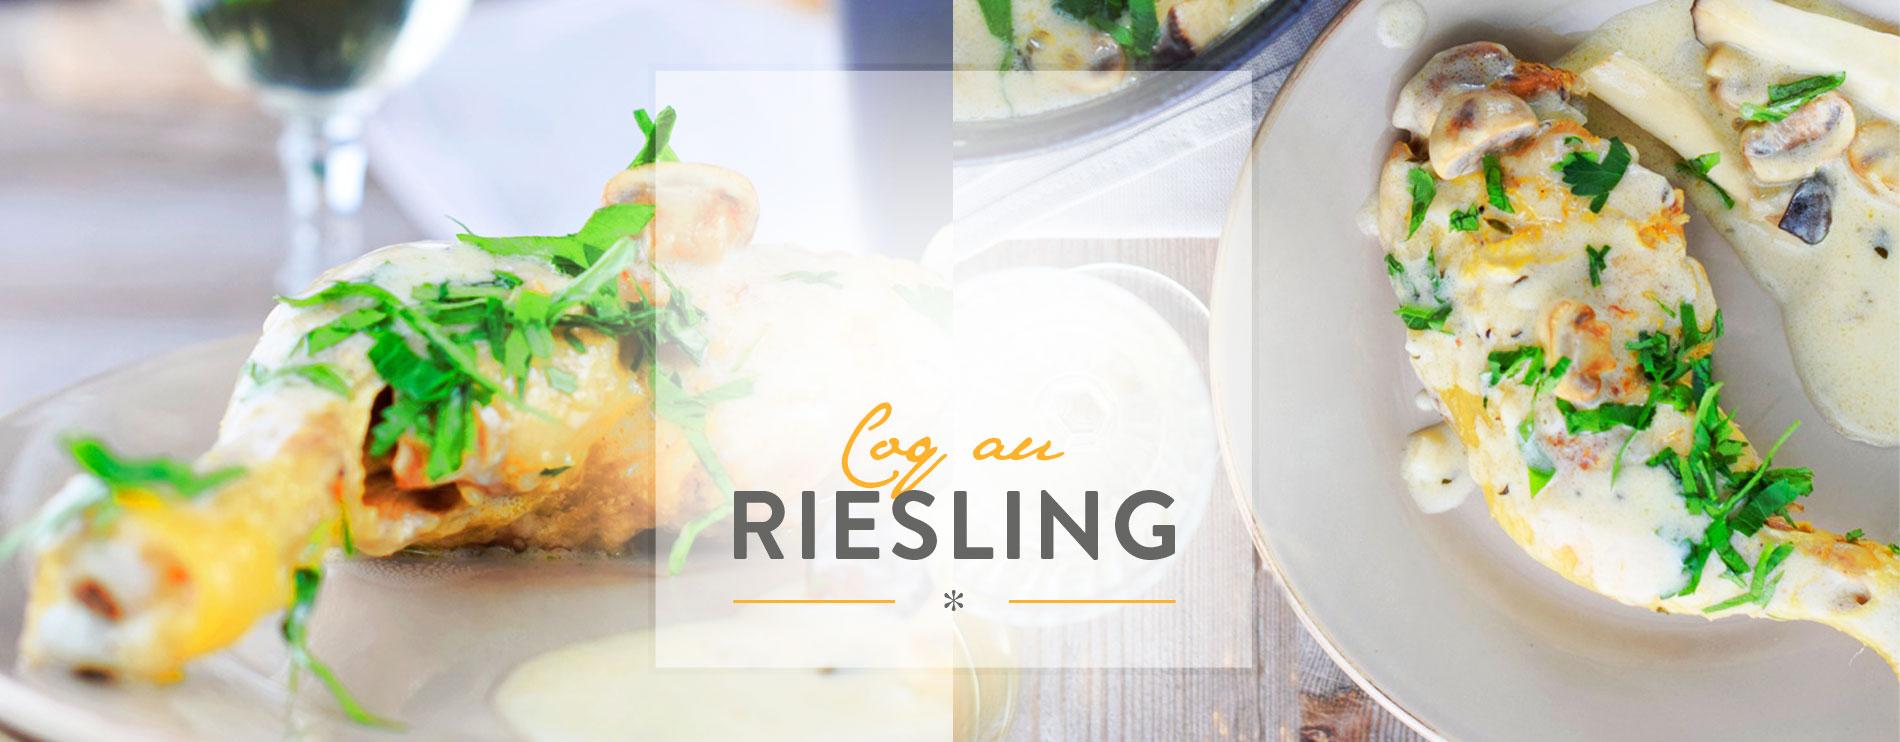 Header Coq au Riesling